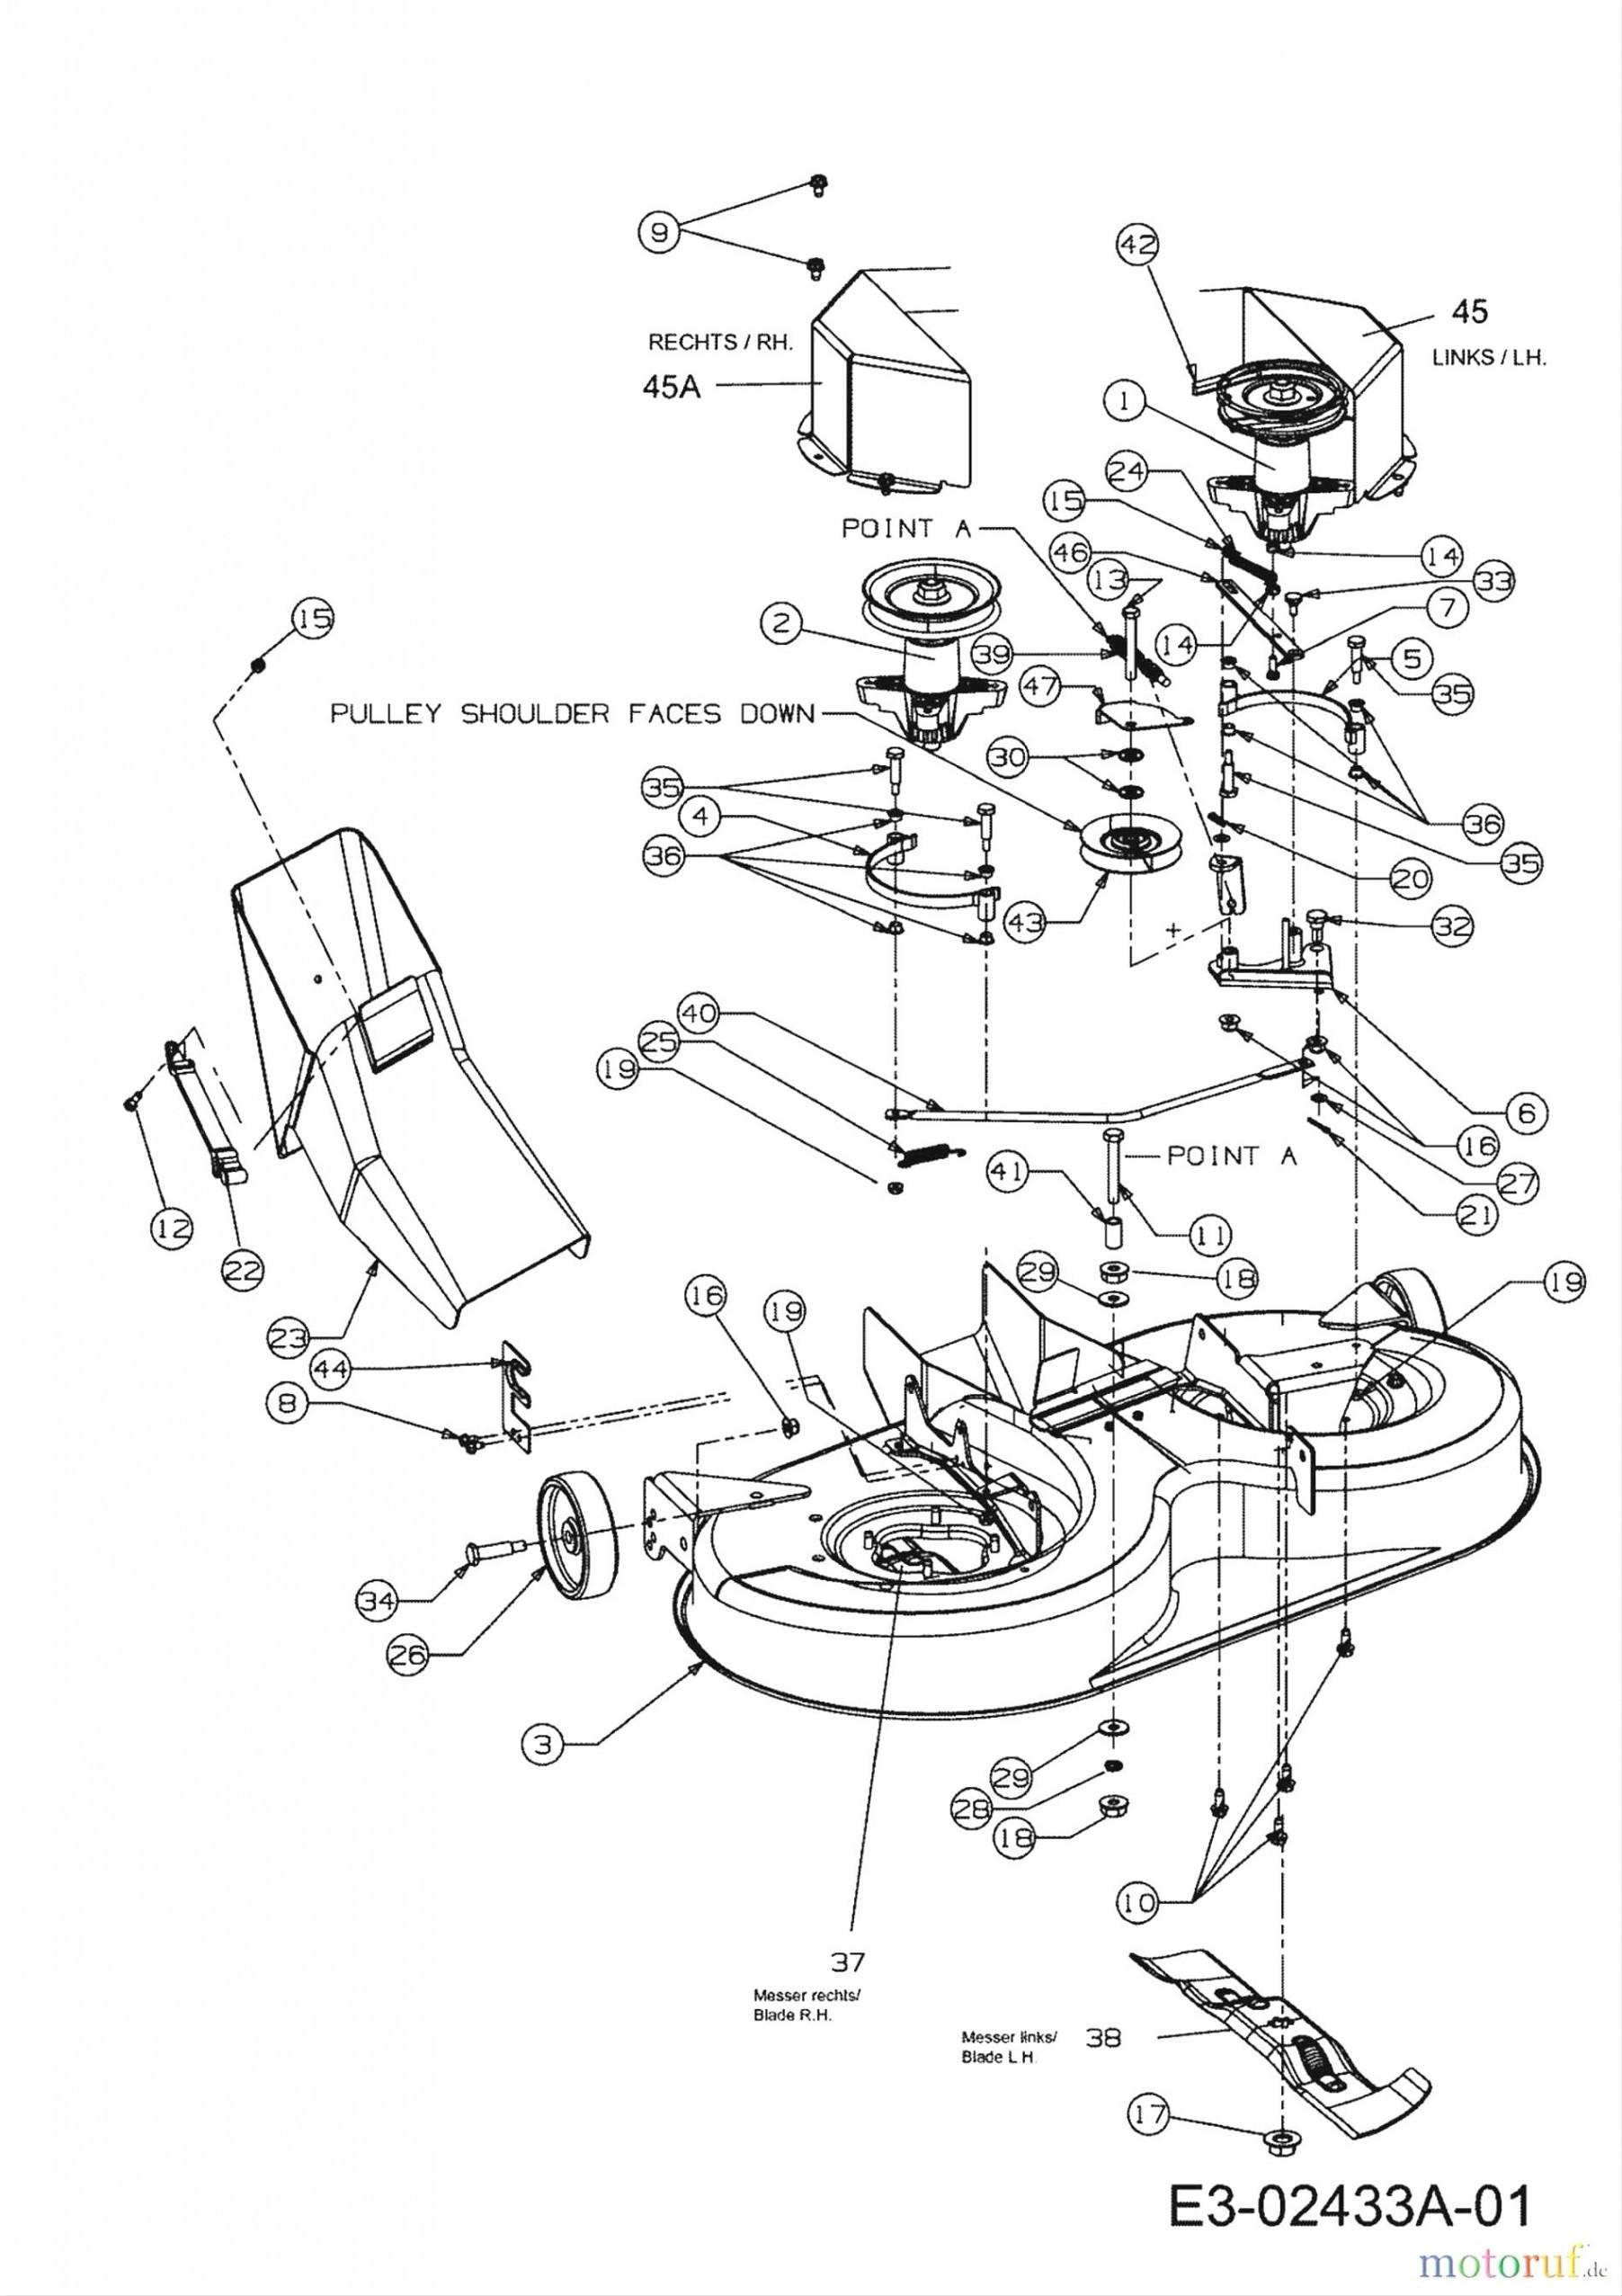 Honda 6 5 Hp Engine Parts Diagram 2 150cc Pdf Wiring Lawn Mower Of